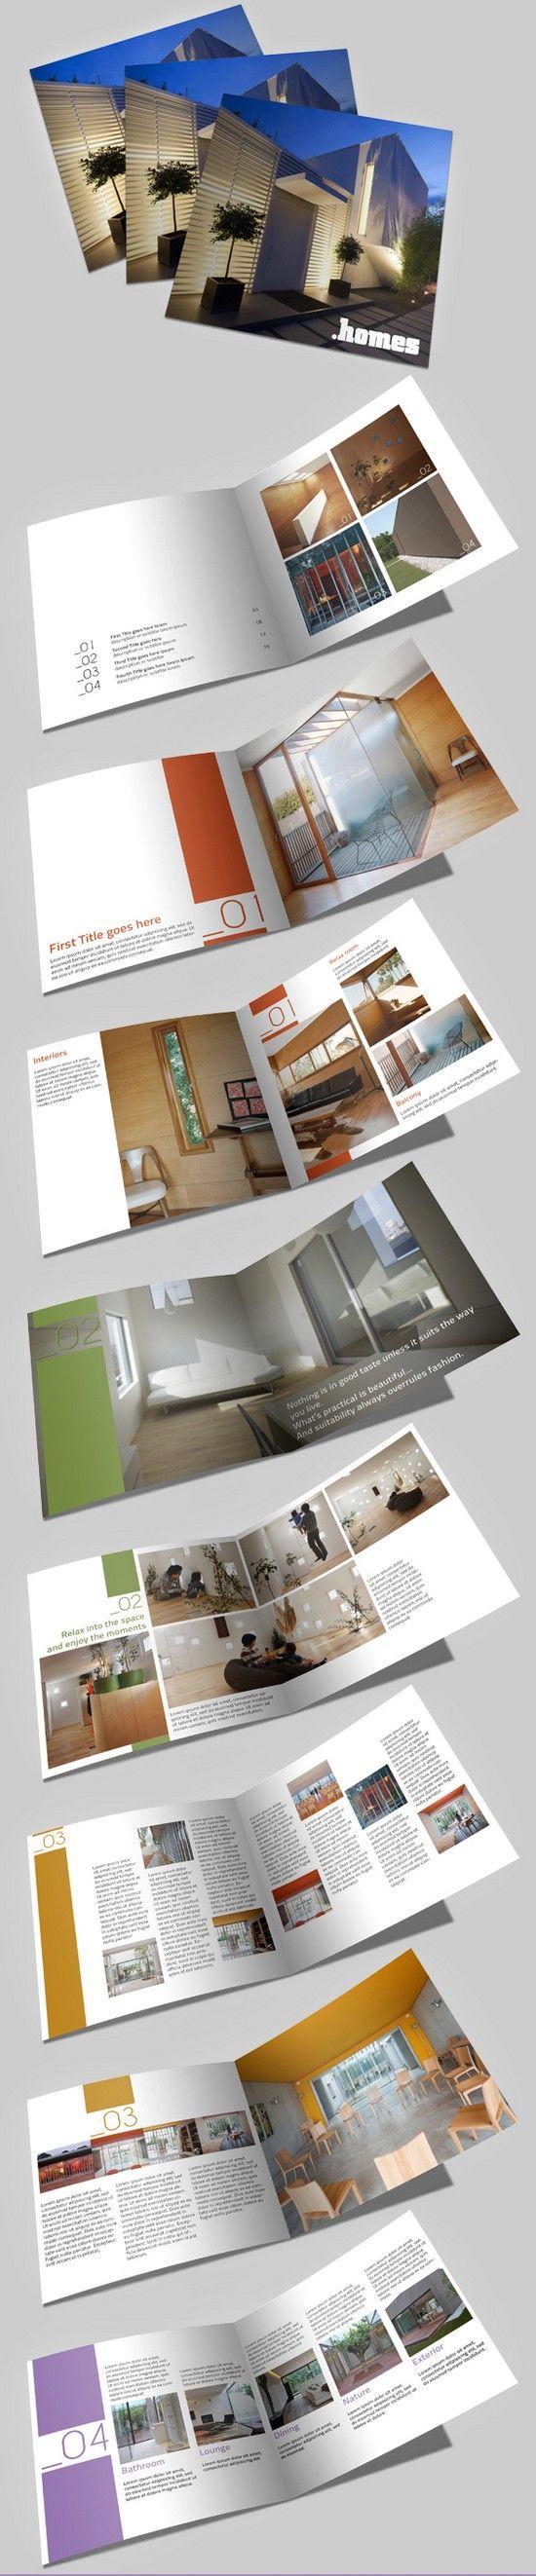 Homes Brochure